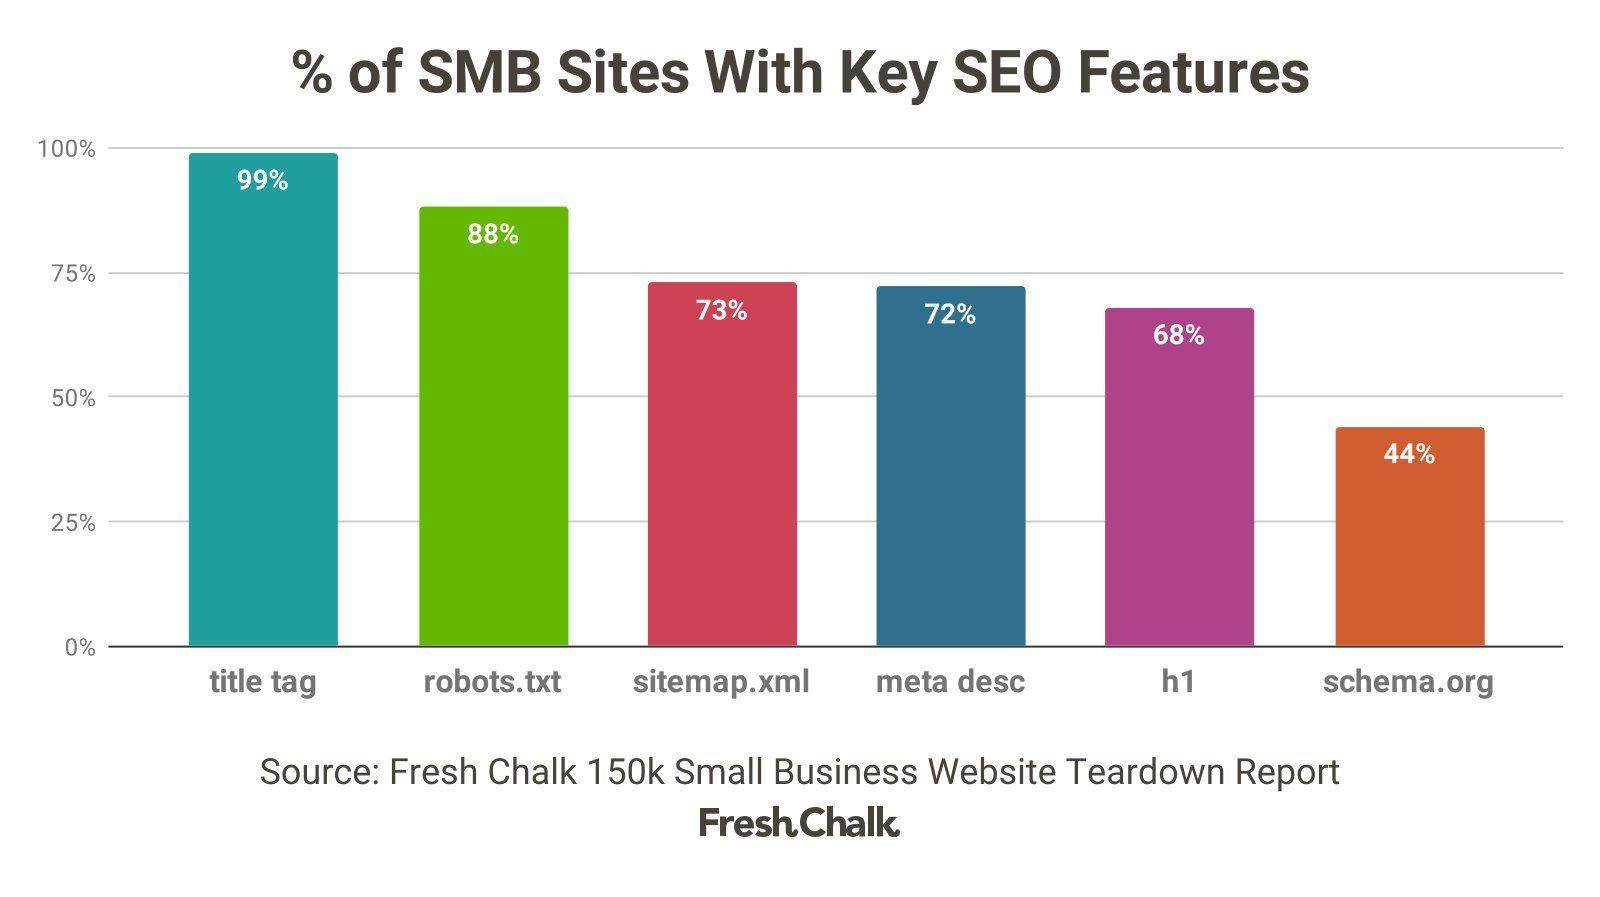 150k Small Business Website Teardown 2019 • Fresh Chalk